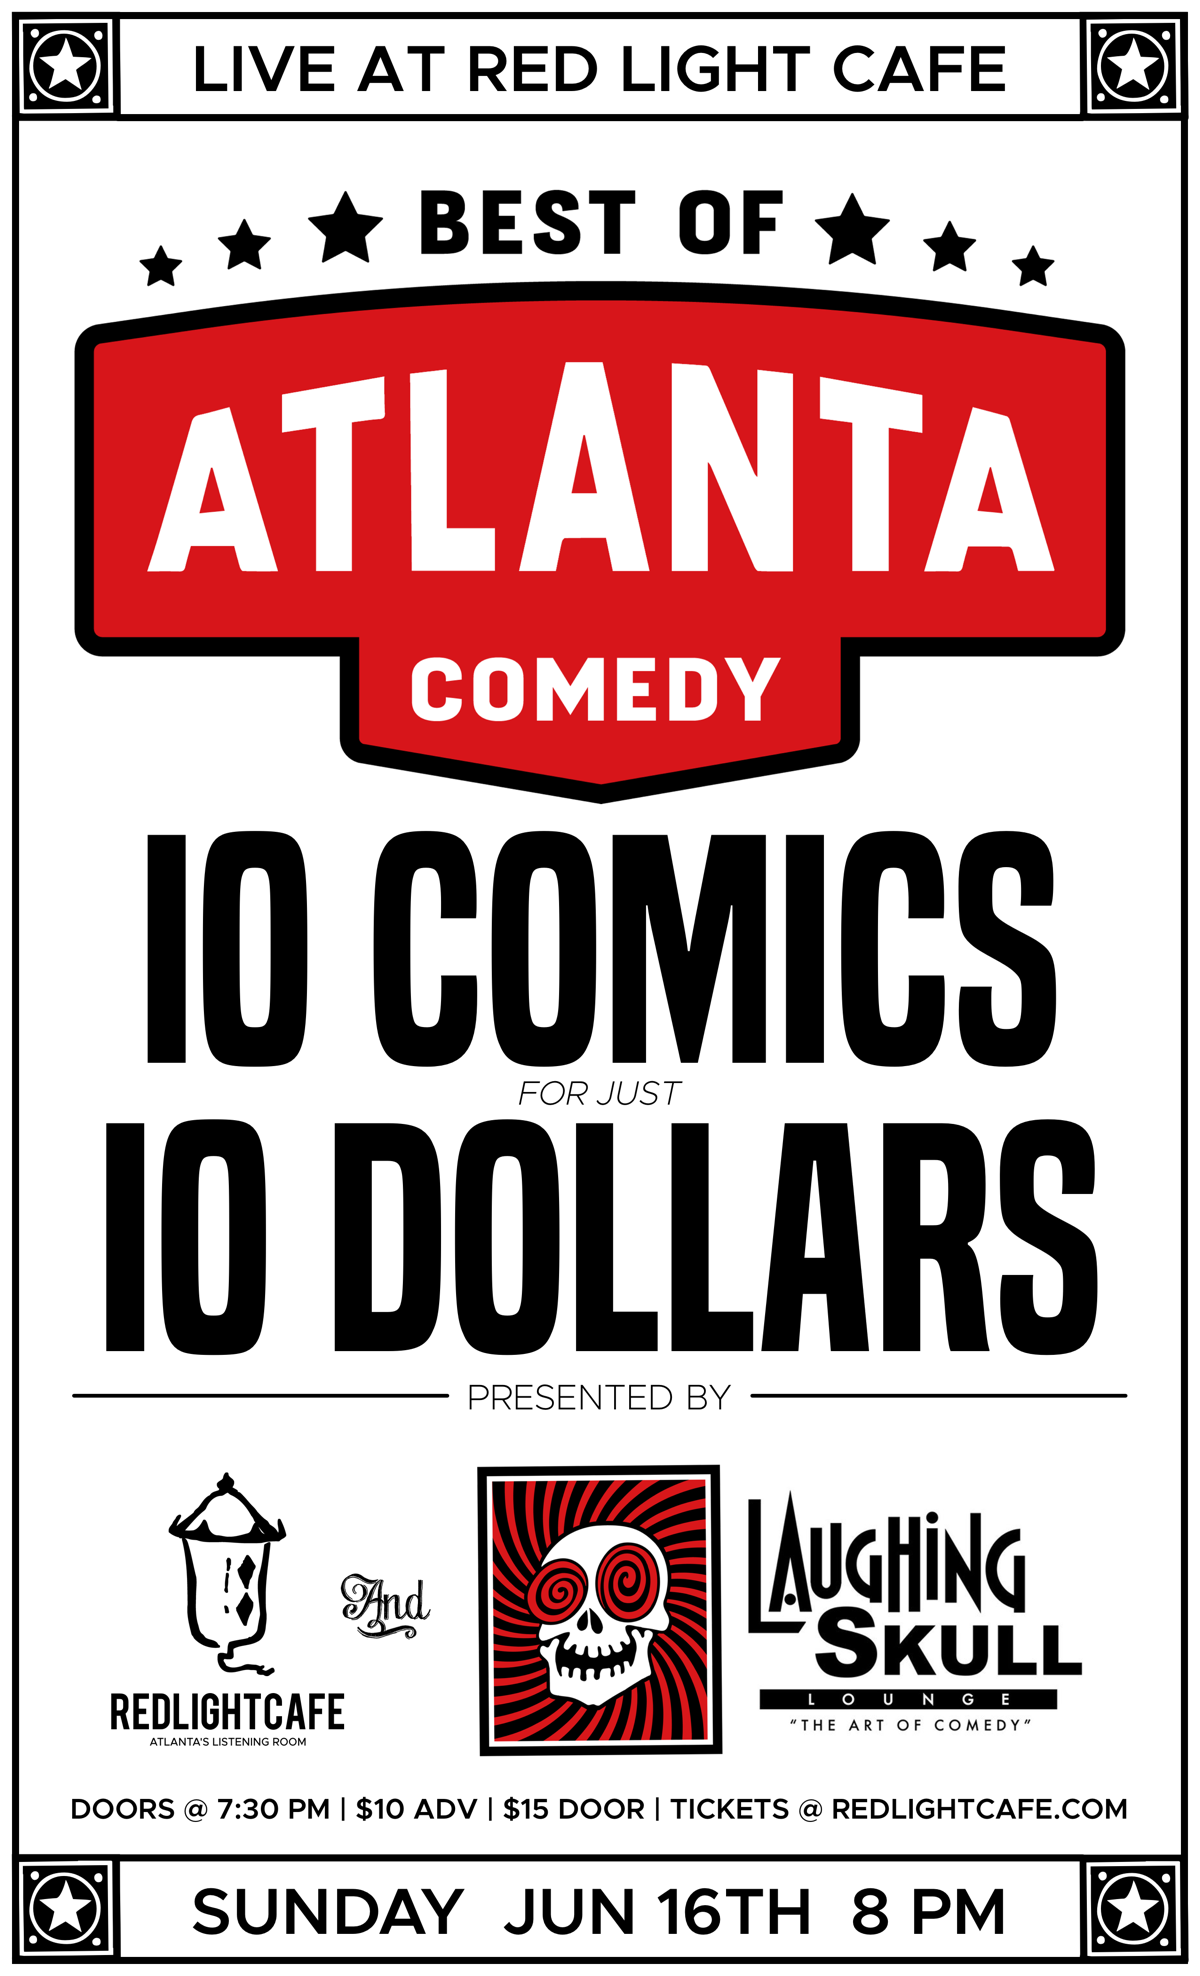 Best of Atlanta Comedy at Red Light Café presented by Laughing Skull Lounge — June 16, 2019 — Red Light Café, Atlanta, GA